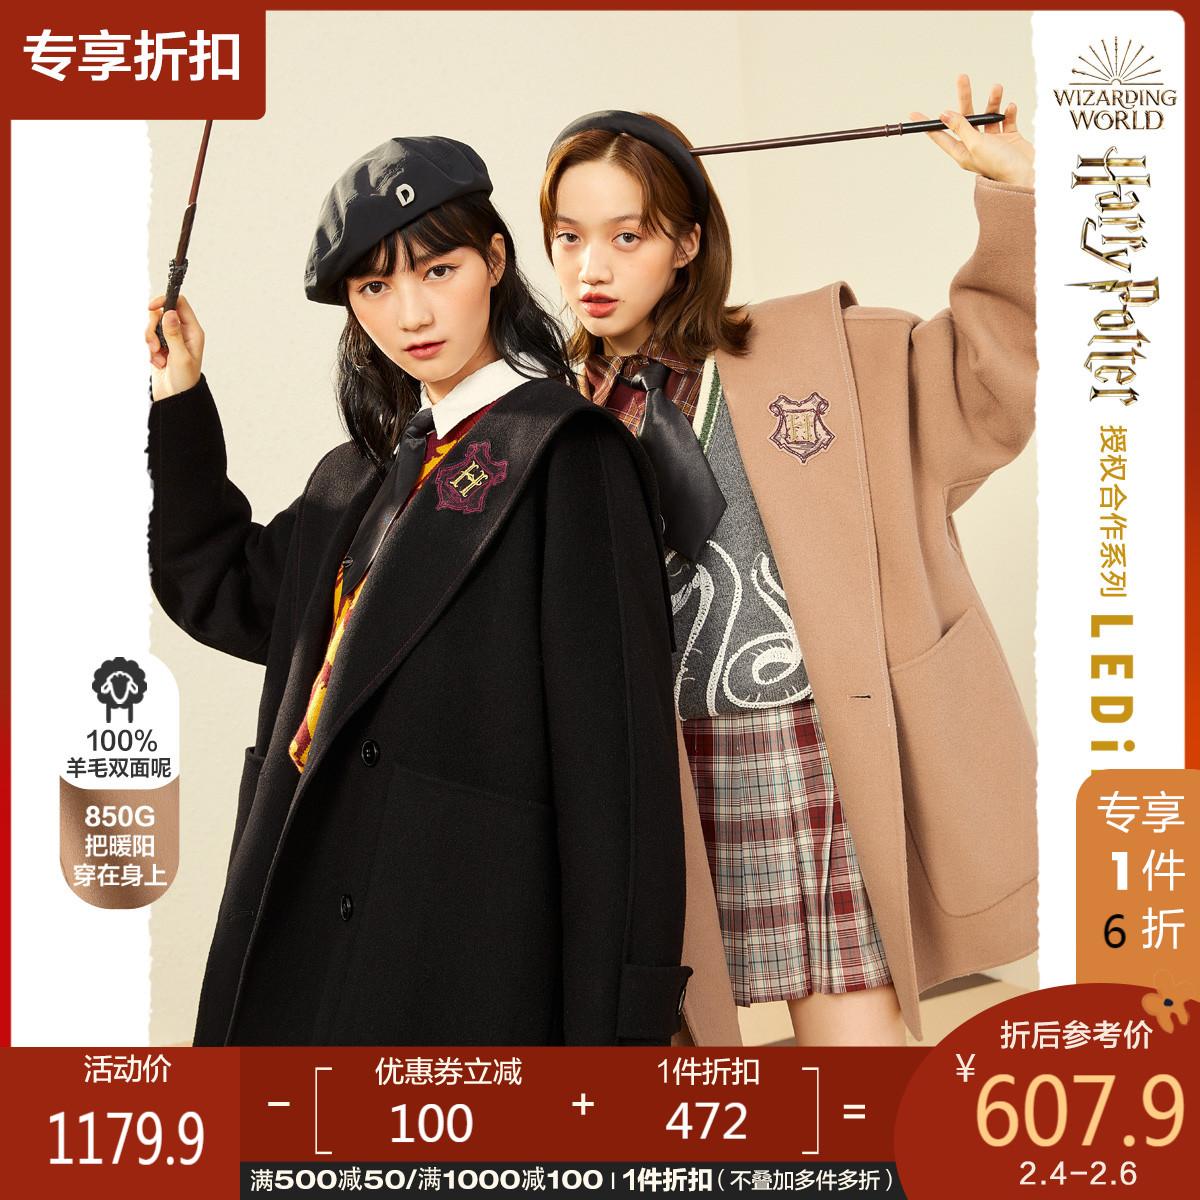 (Harry Potter co-named) Les coat 2020 winter new all-wool wool coat female loose little man